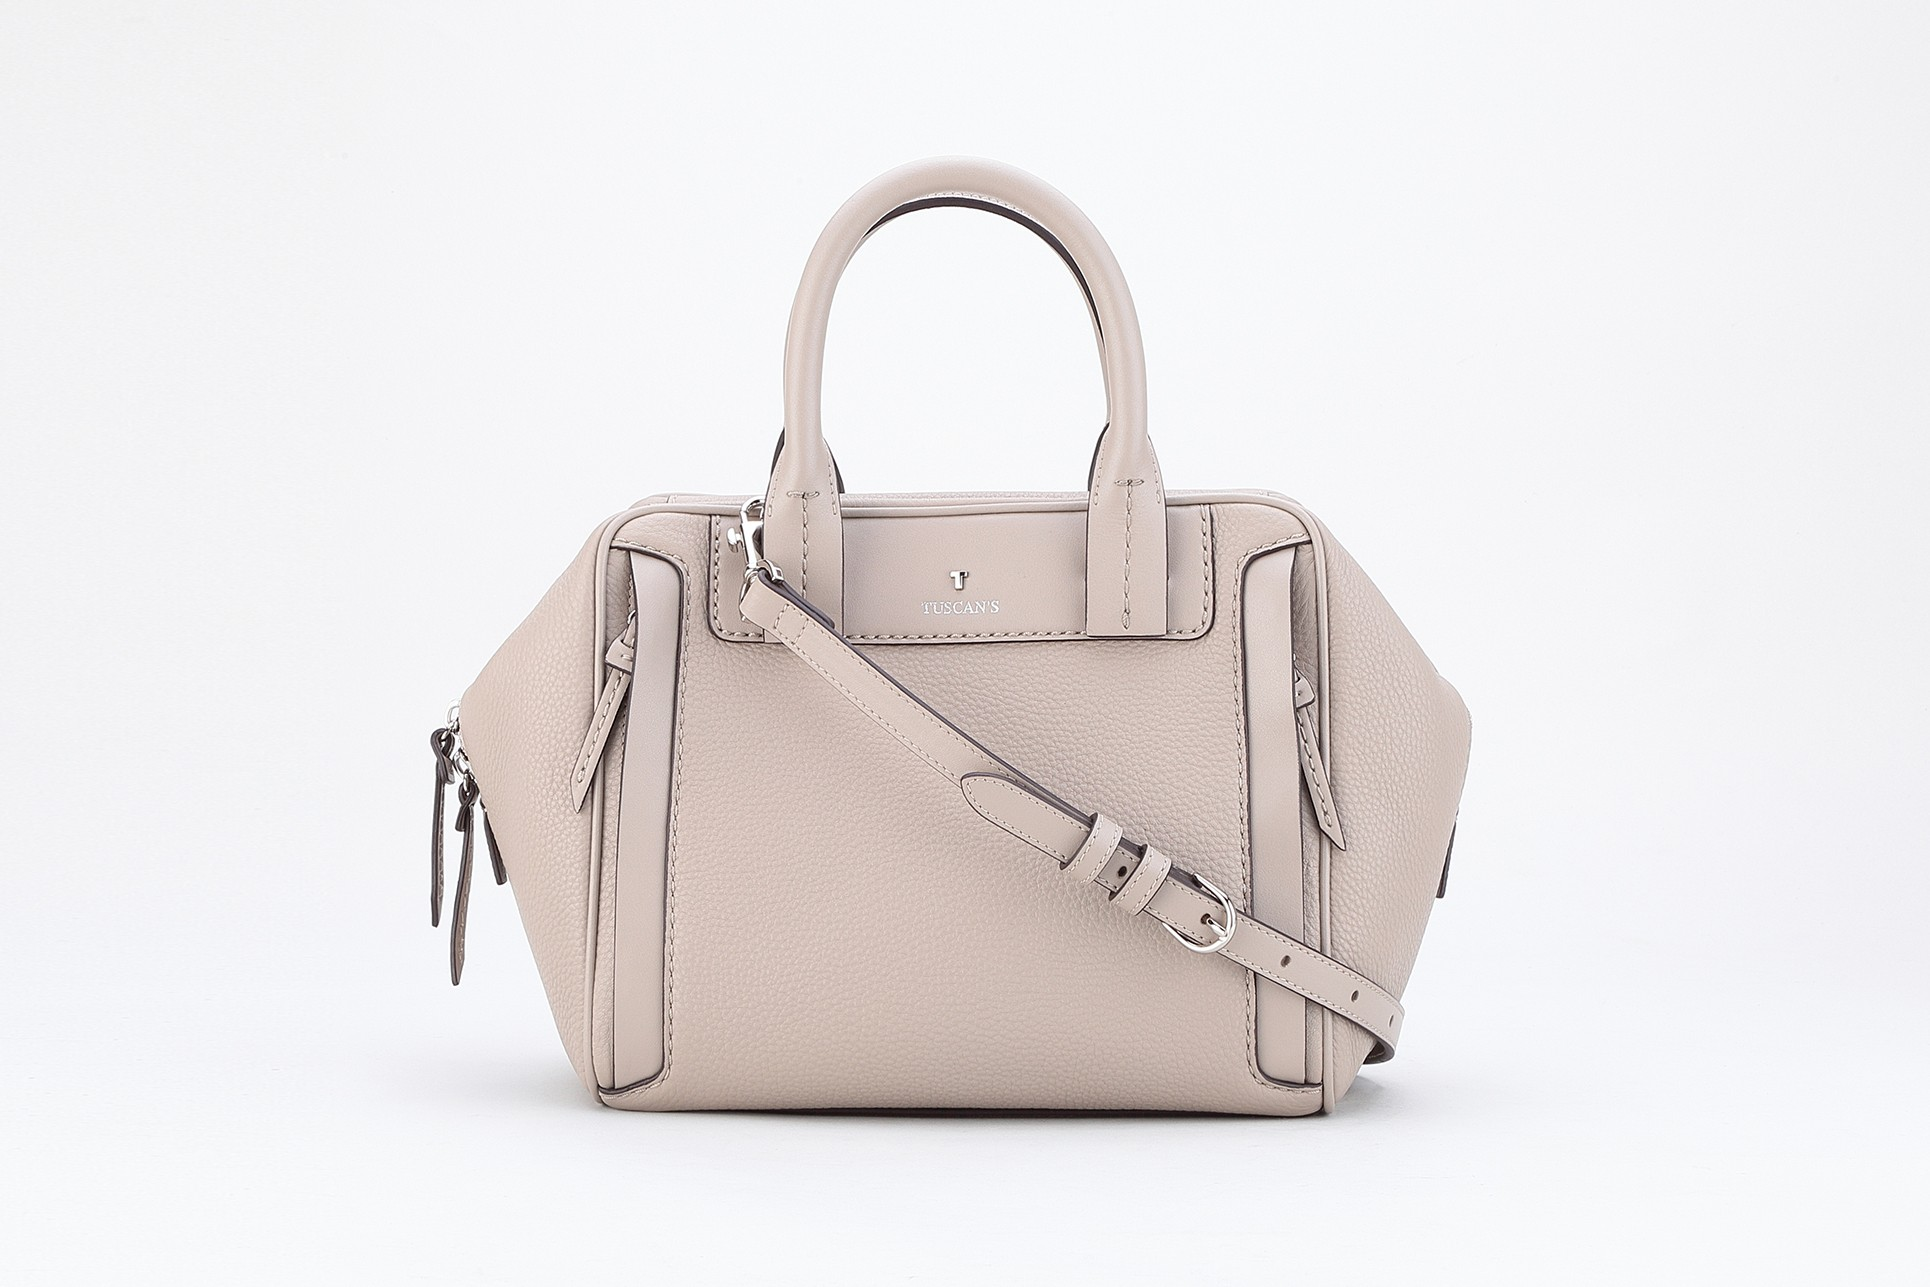 NAPOLI Satchel Bag